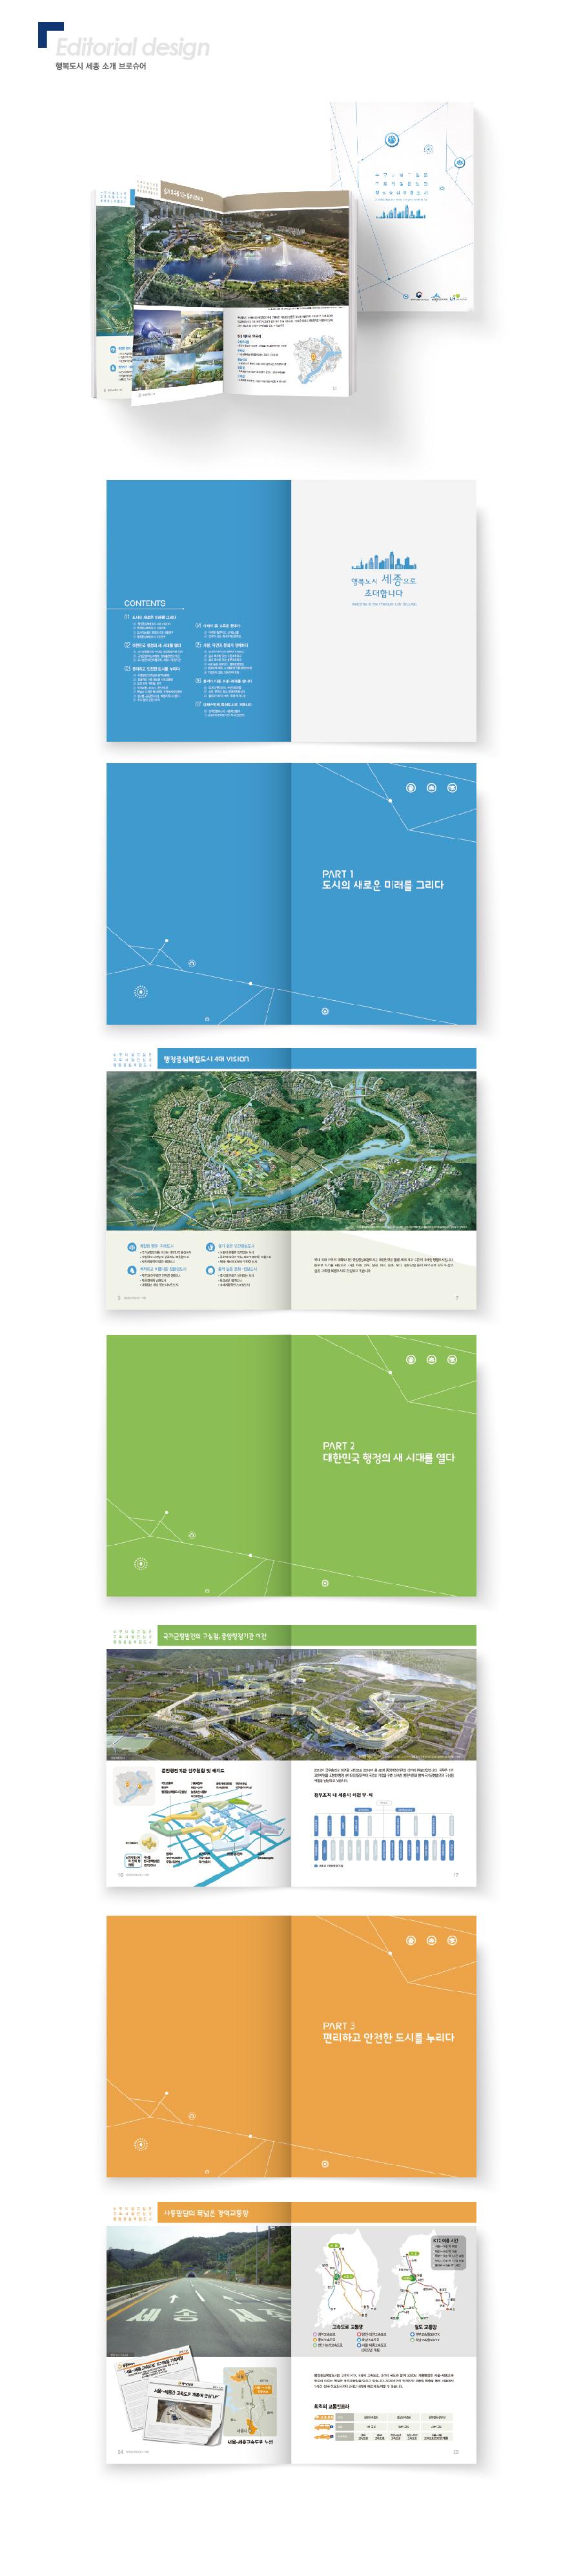 02 Editorial design-01.jpg